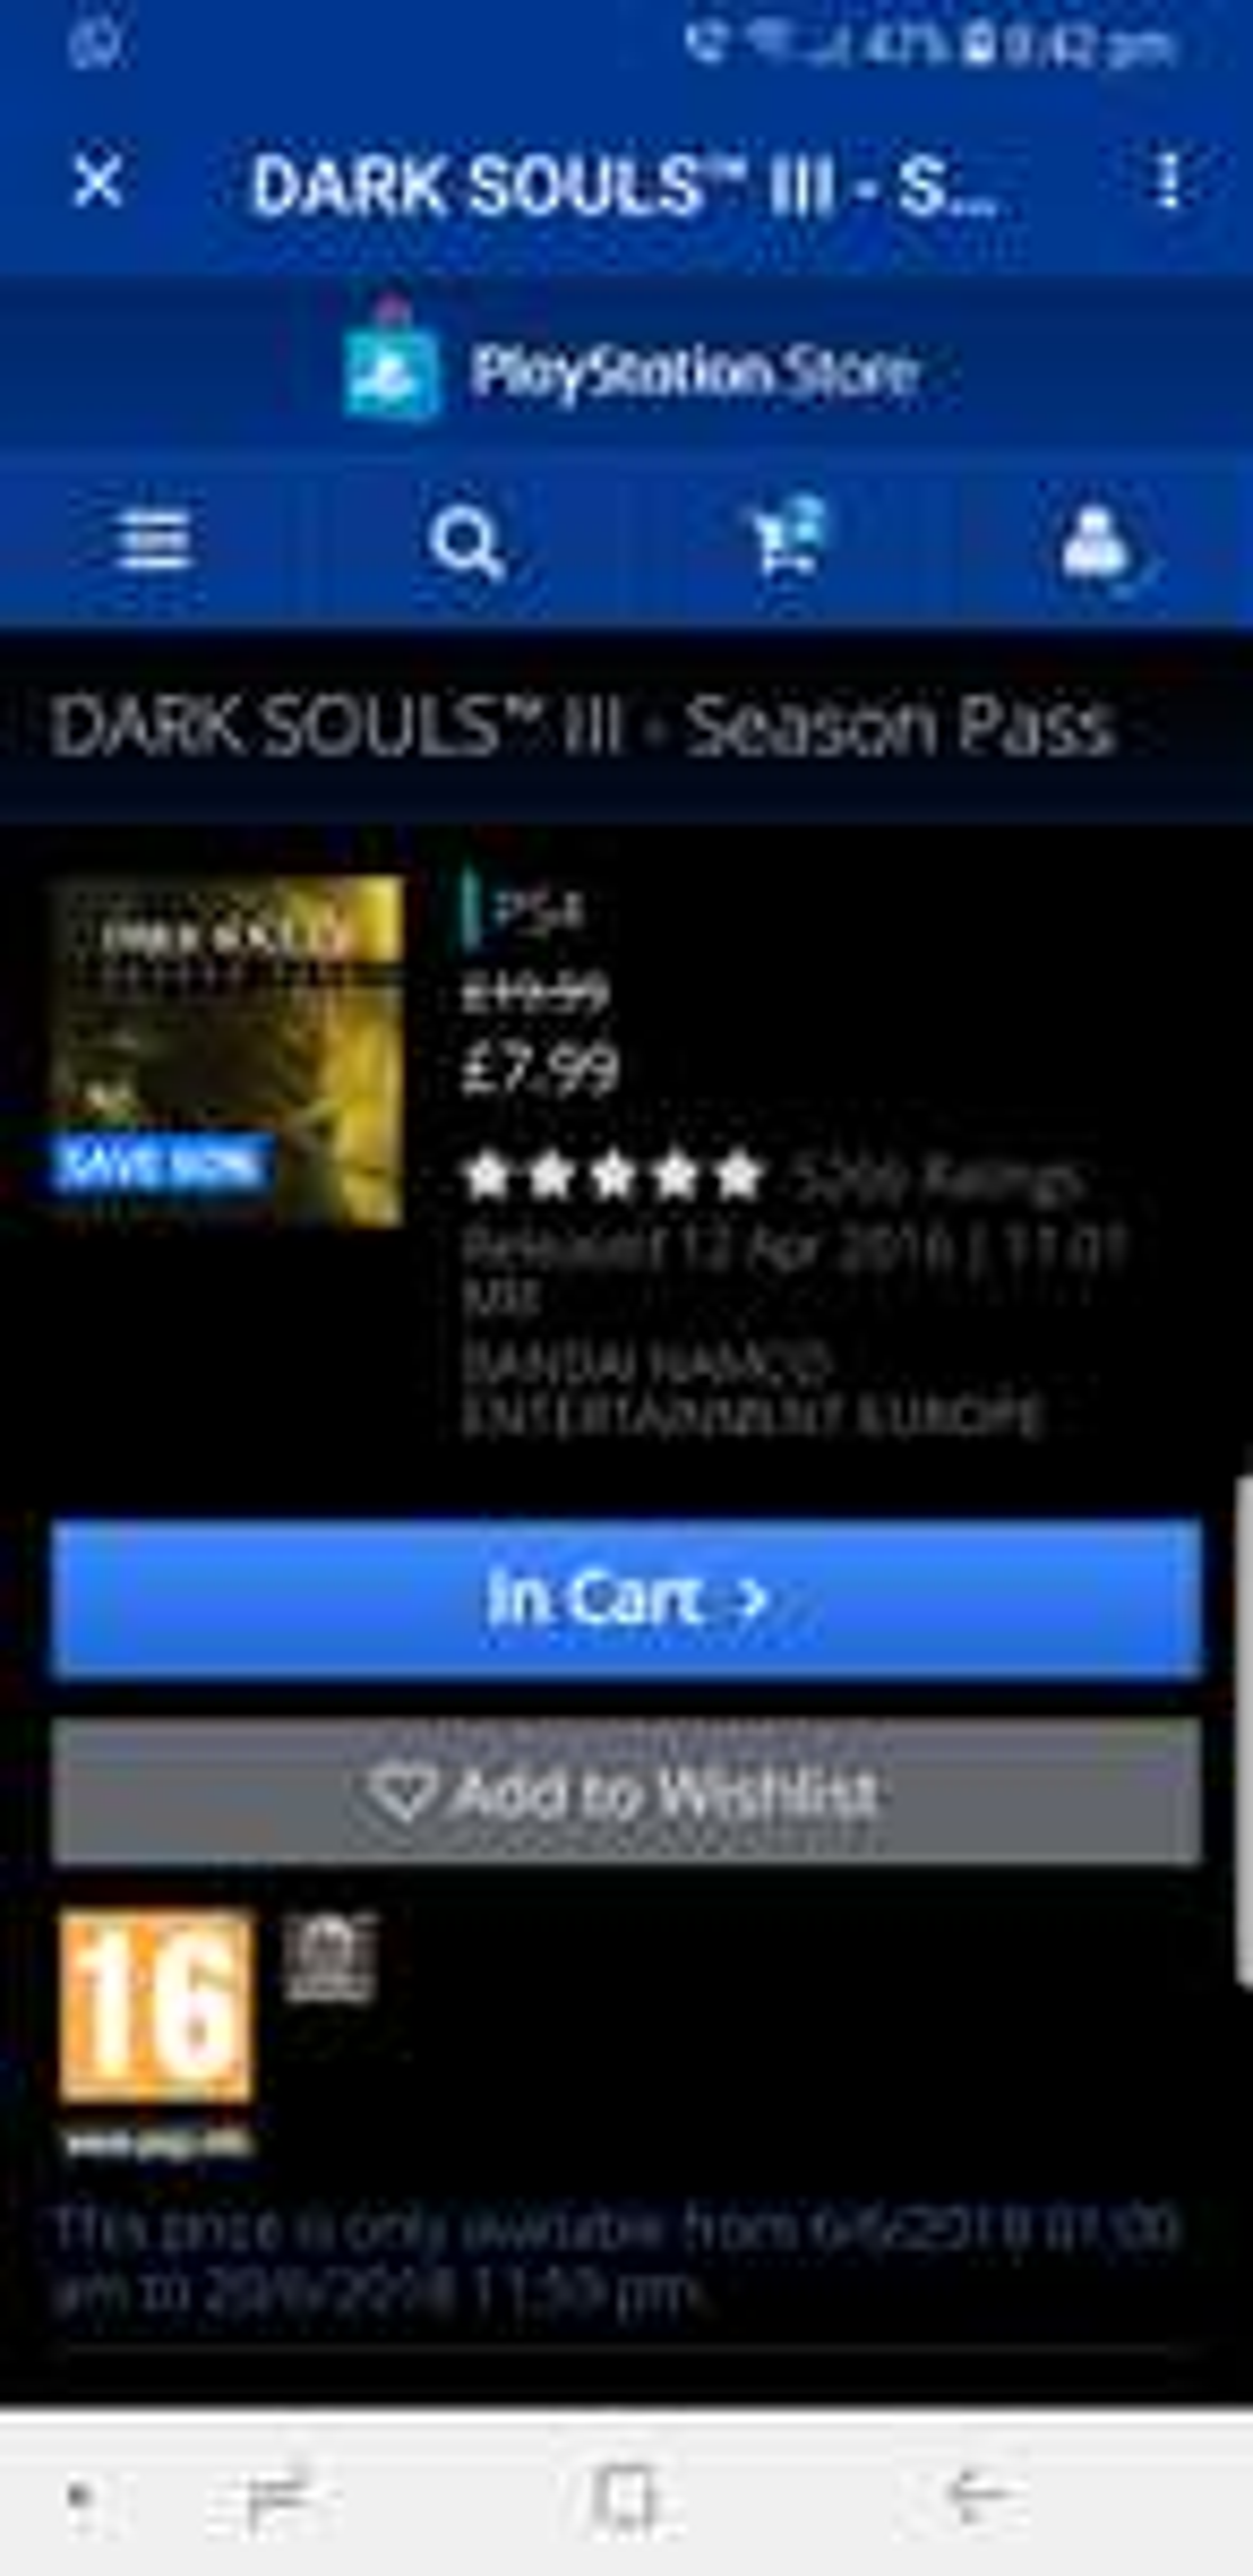 Dark souls 3 psn season pass £7.99